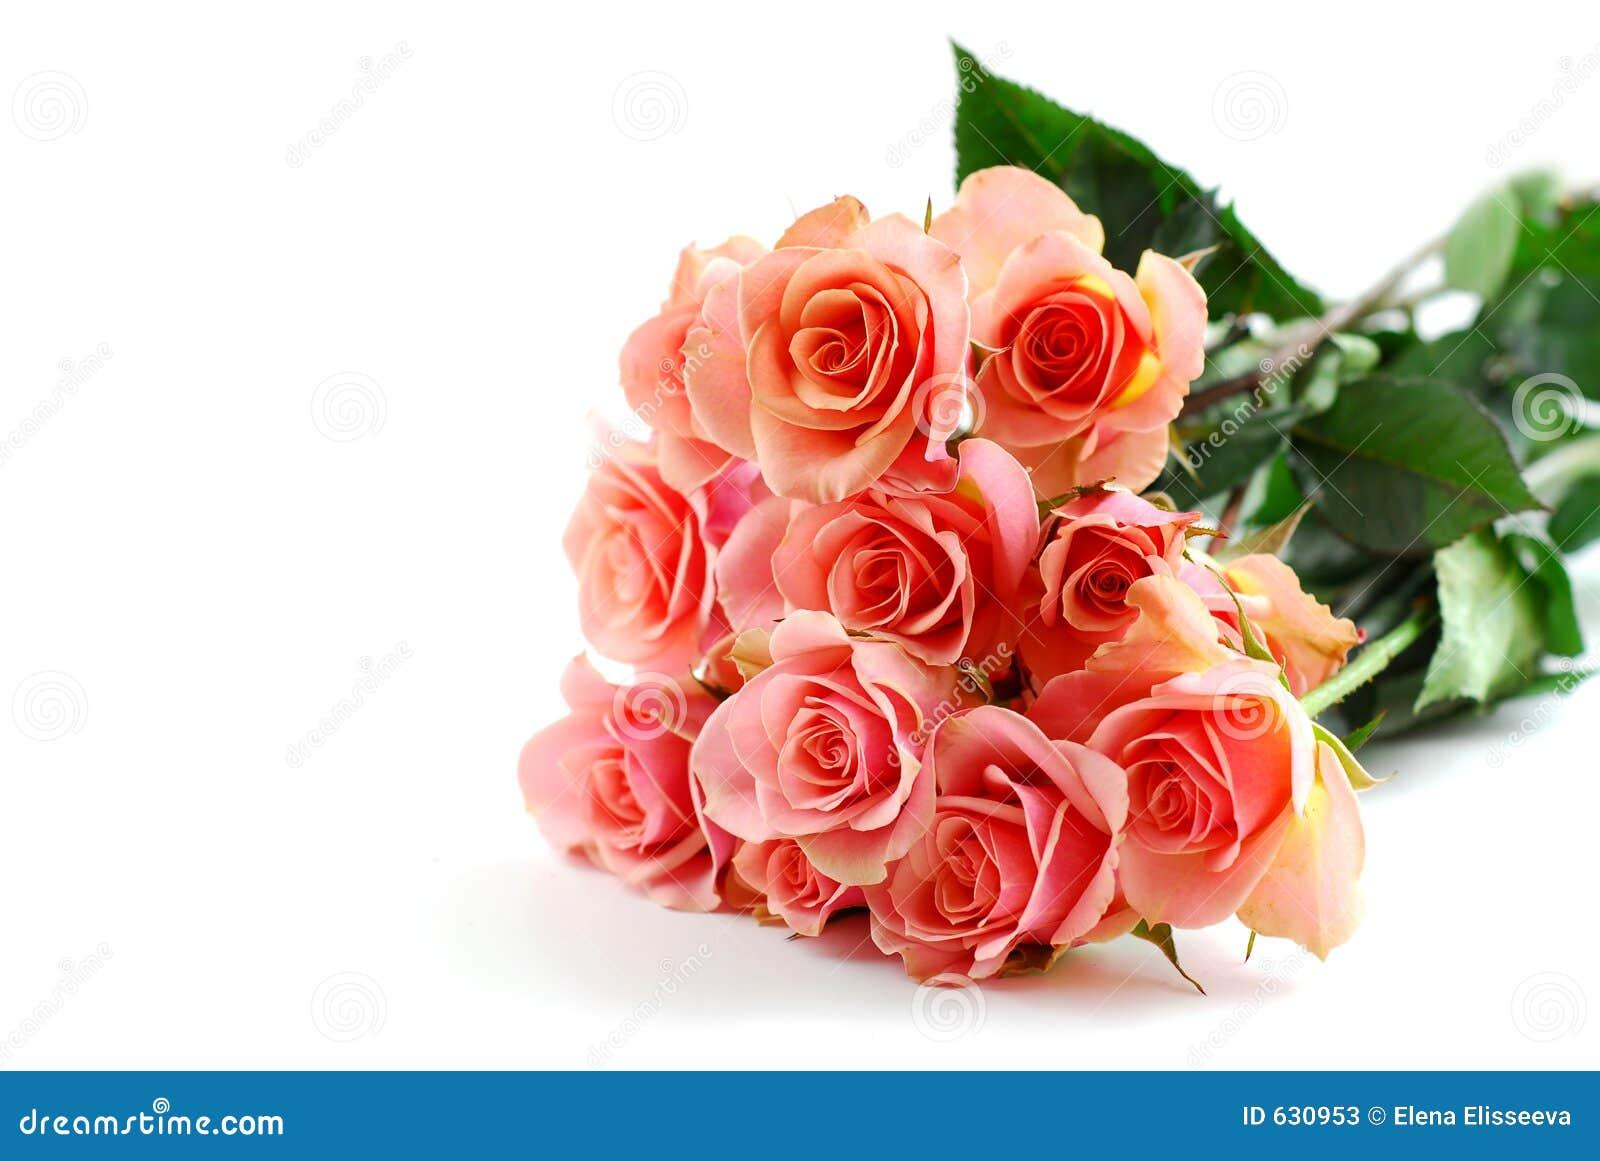 pink rose bouquet on white stock image image of background 630953. Black Bedroom Furniture Sets. Home Design Ideas